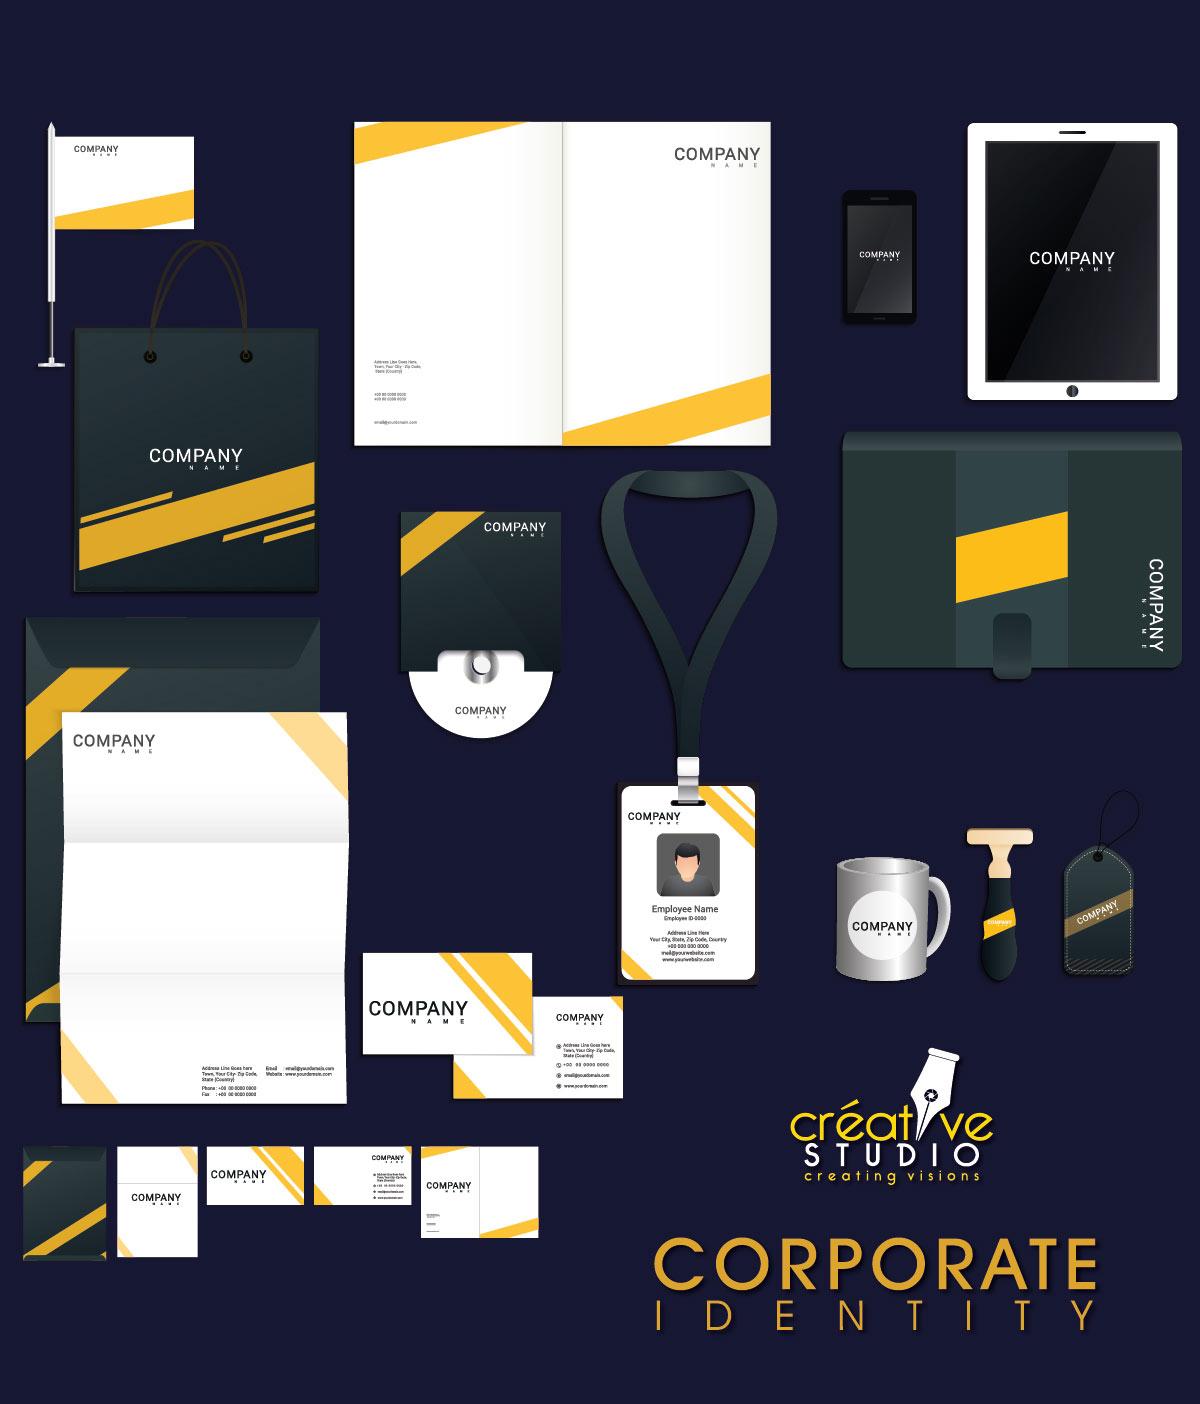 Corporate Identity 8 - Corporate Identity